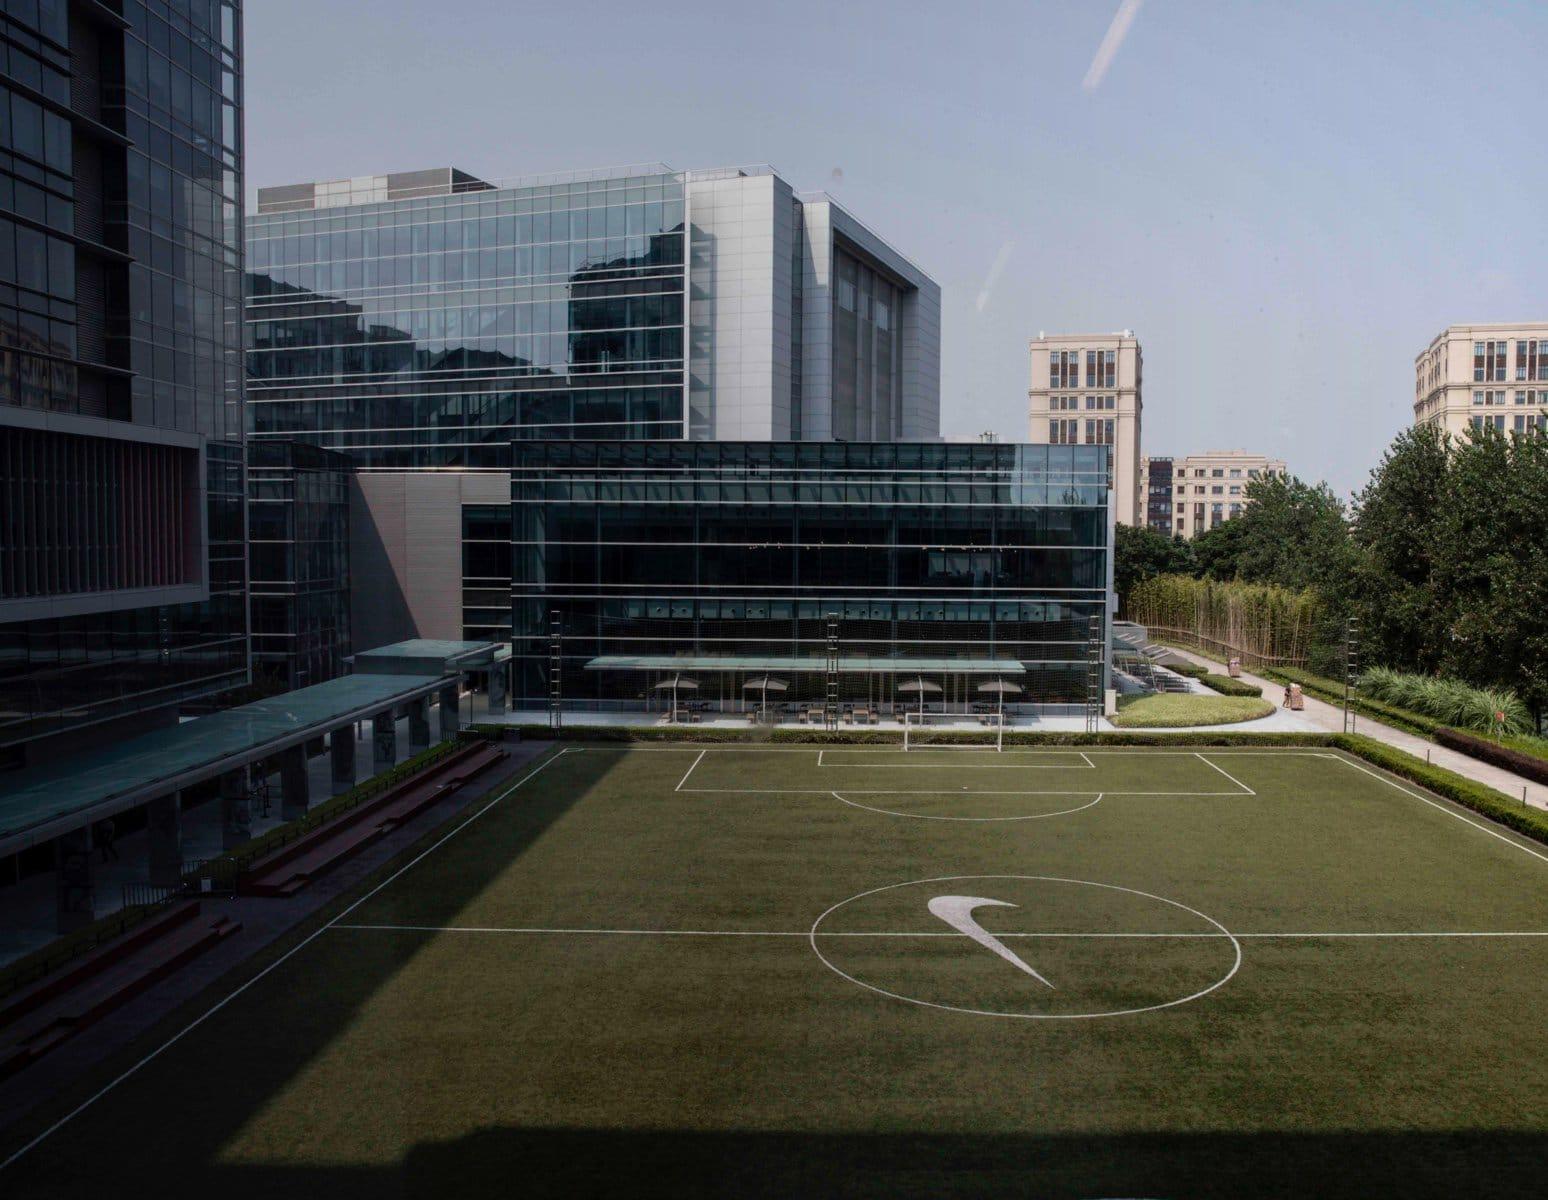 historia Iluminar legal  Nike Greater China Headquarters